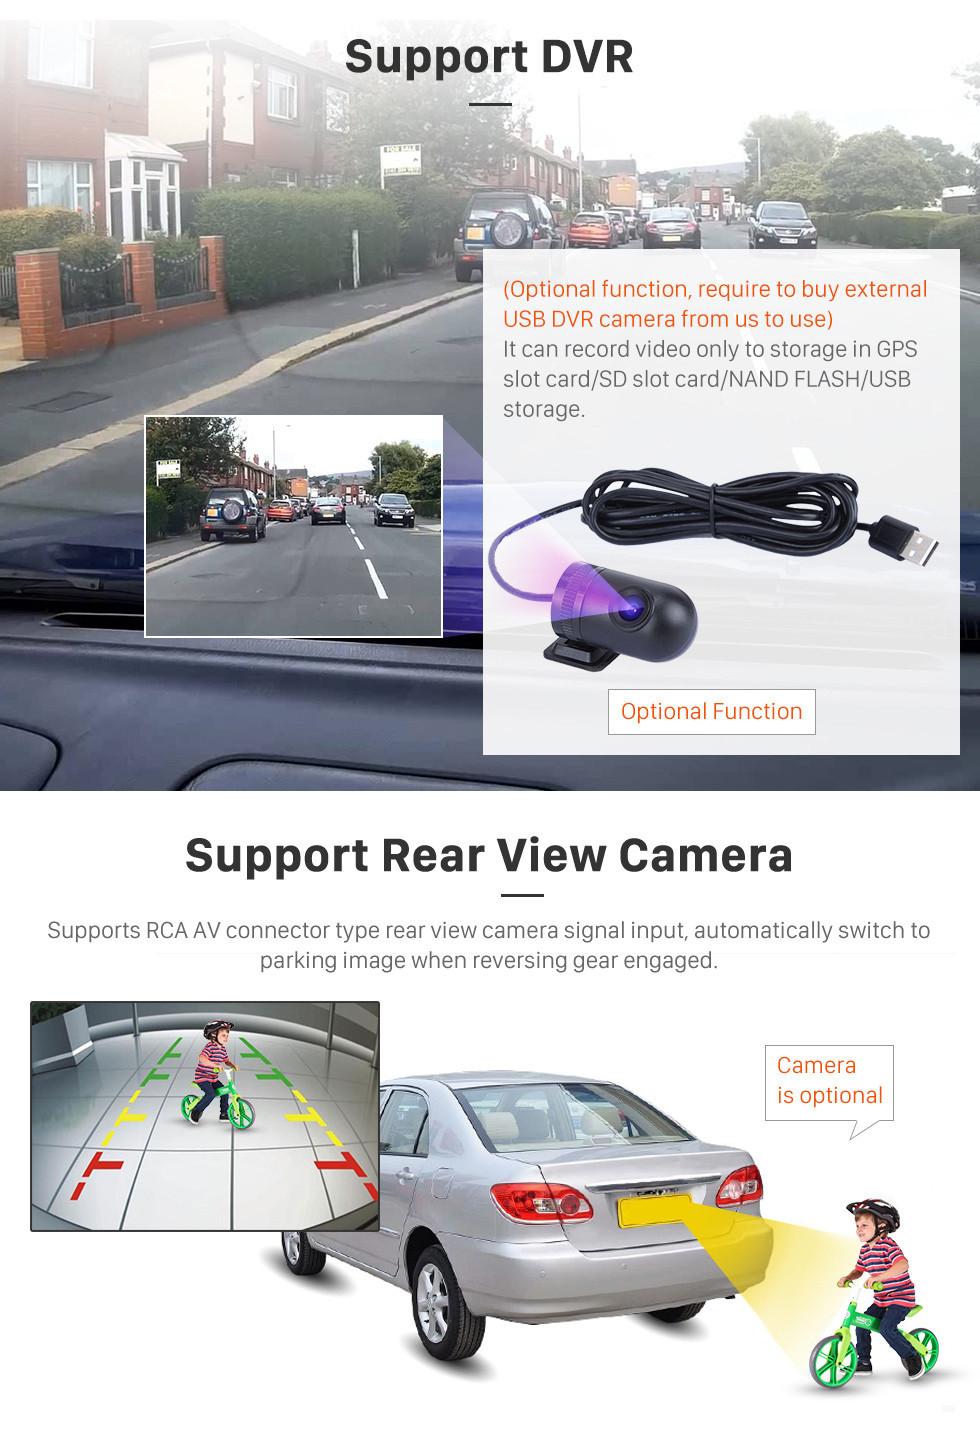 Seicane HD Touchscreen 2015 Changan EADO Android 10.0 9 inch GPS Navigation Radio Bluetooth WIFI USB Carplay support DAB+ TPMS OBD2